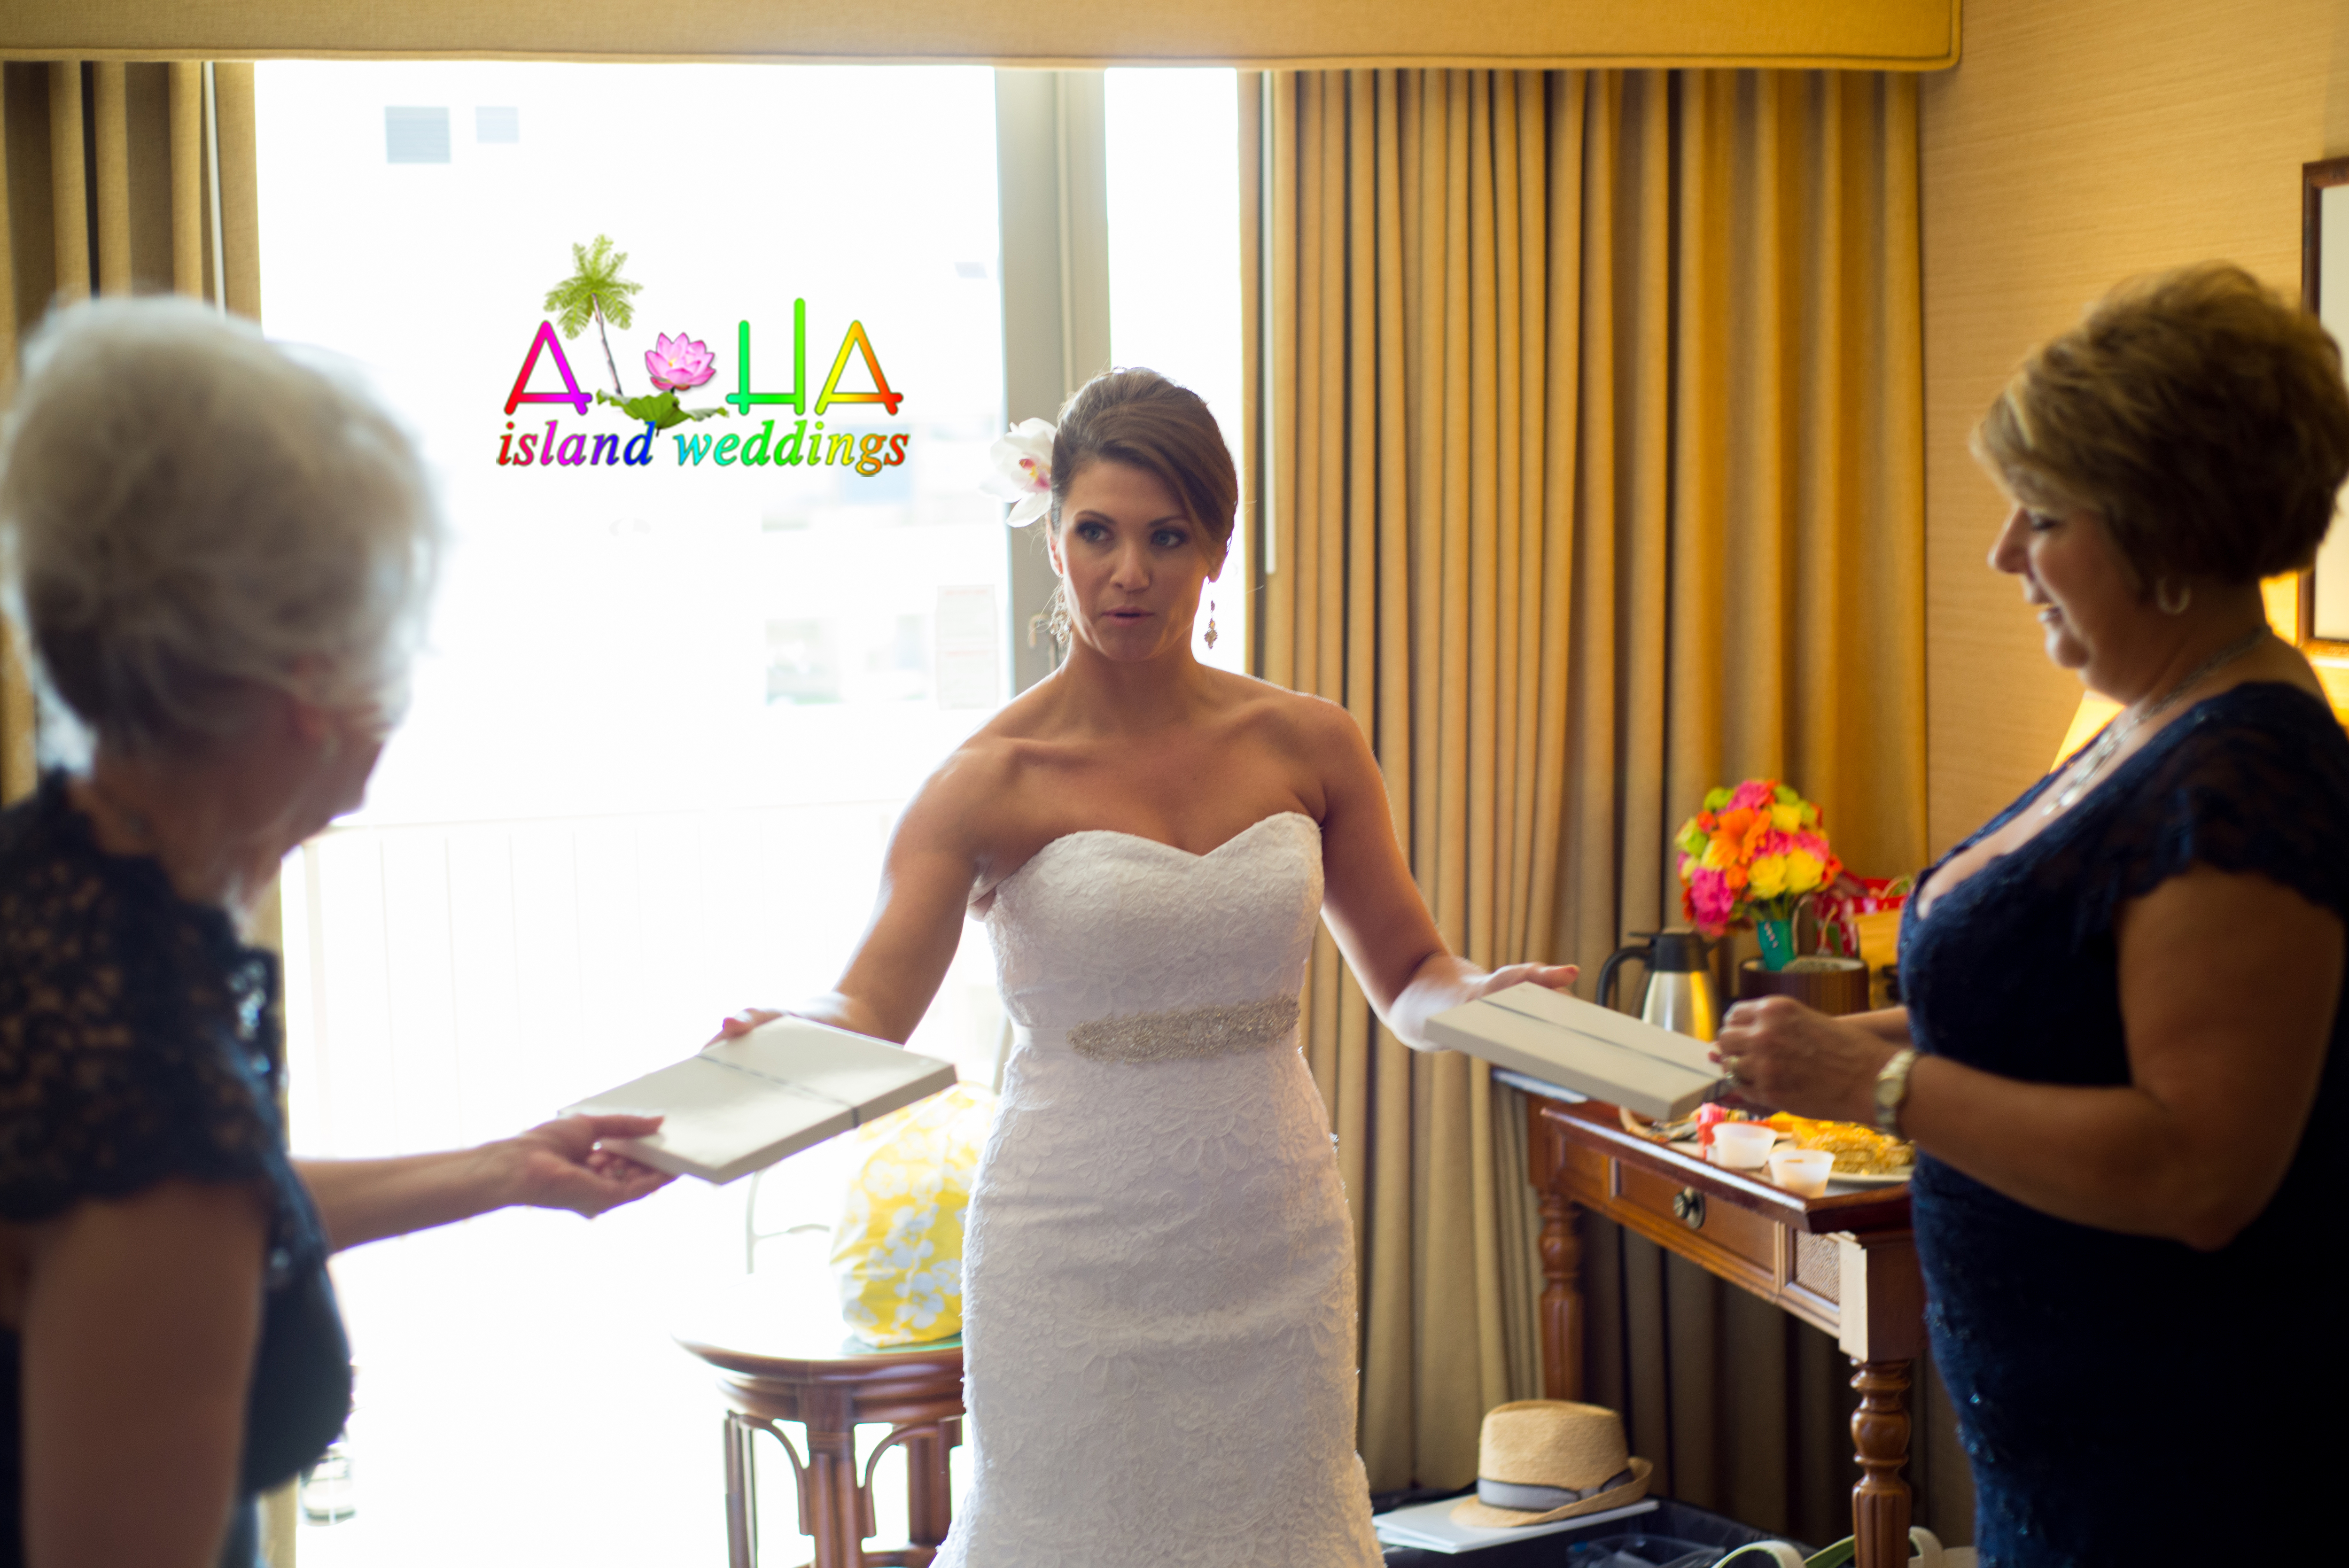 alohaislandweddings- PRE WEDDING IN HAWAII-5